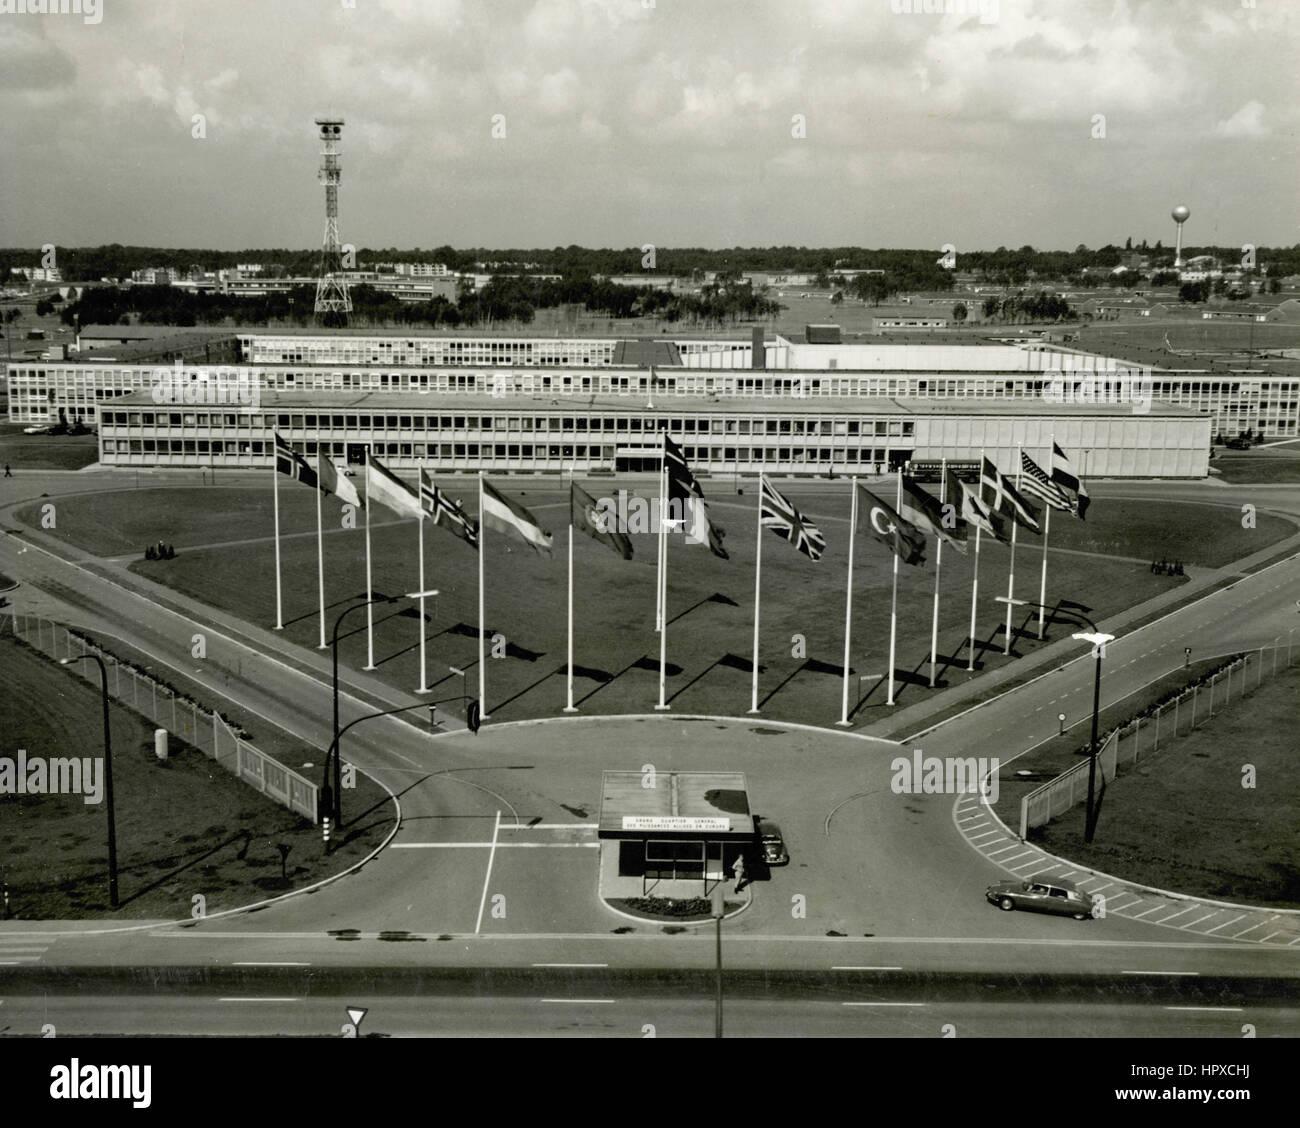 NATO Supreme Headquarters Allied Powers Europe (SHAPE), Mons, Belgium - Stock Image